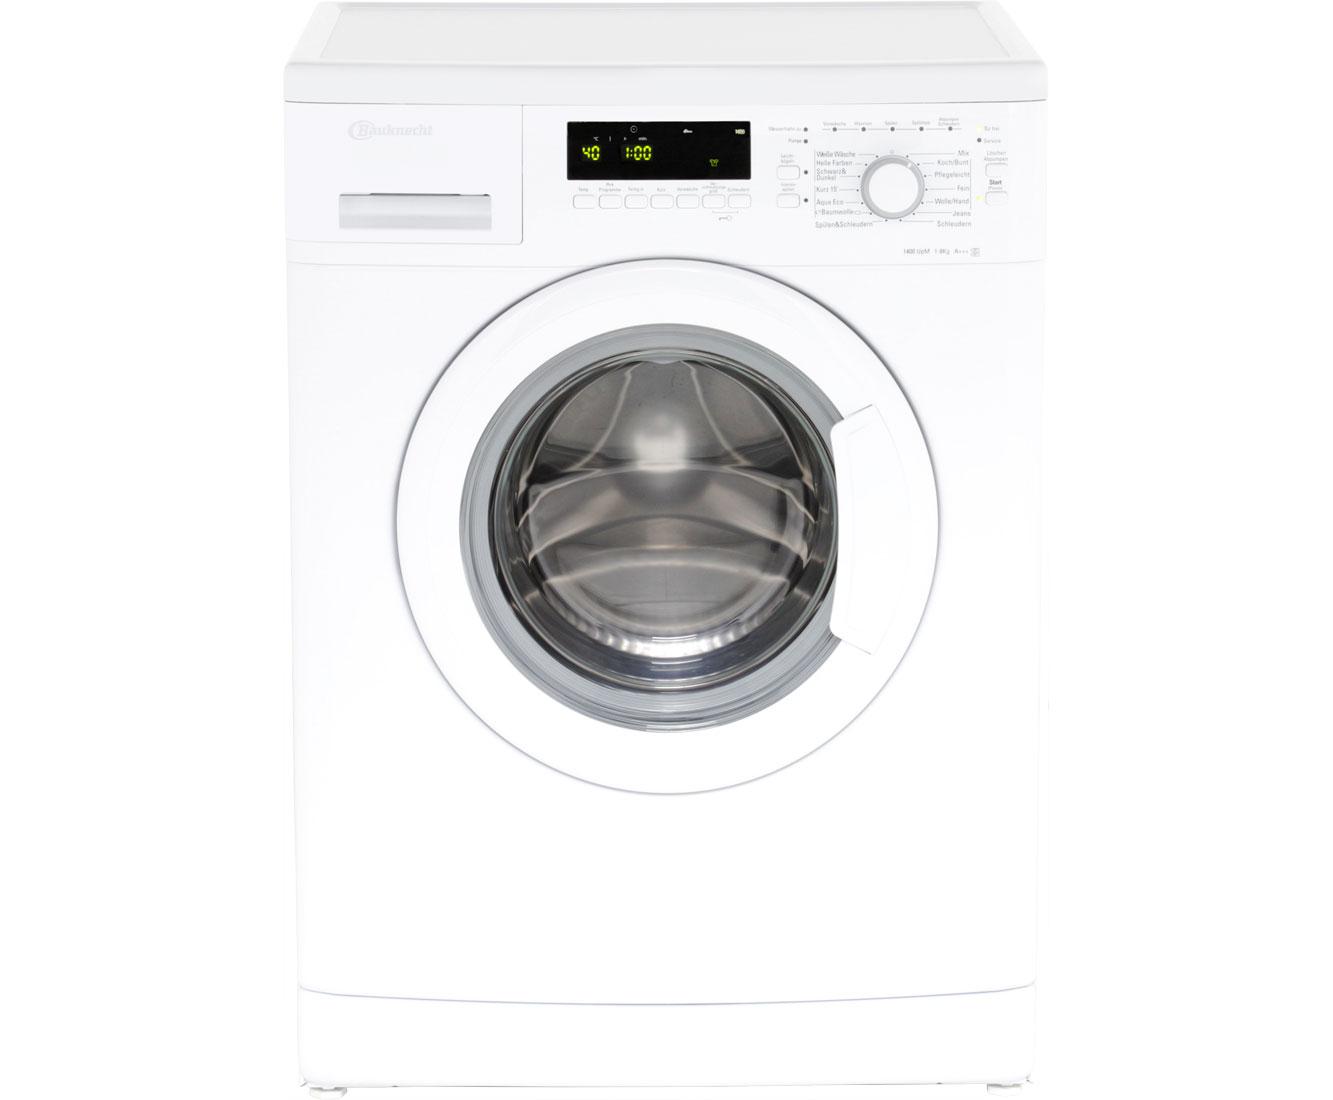 bauknecht wa plus 844 a waschmaschine freistehend weiss neu ebay